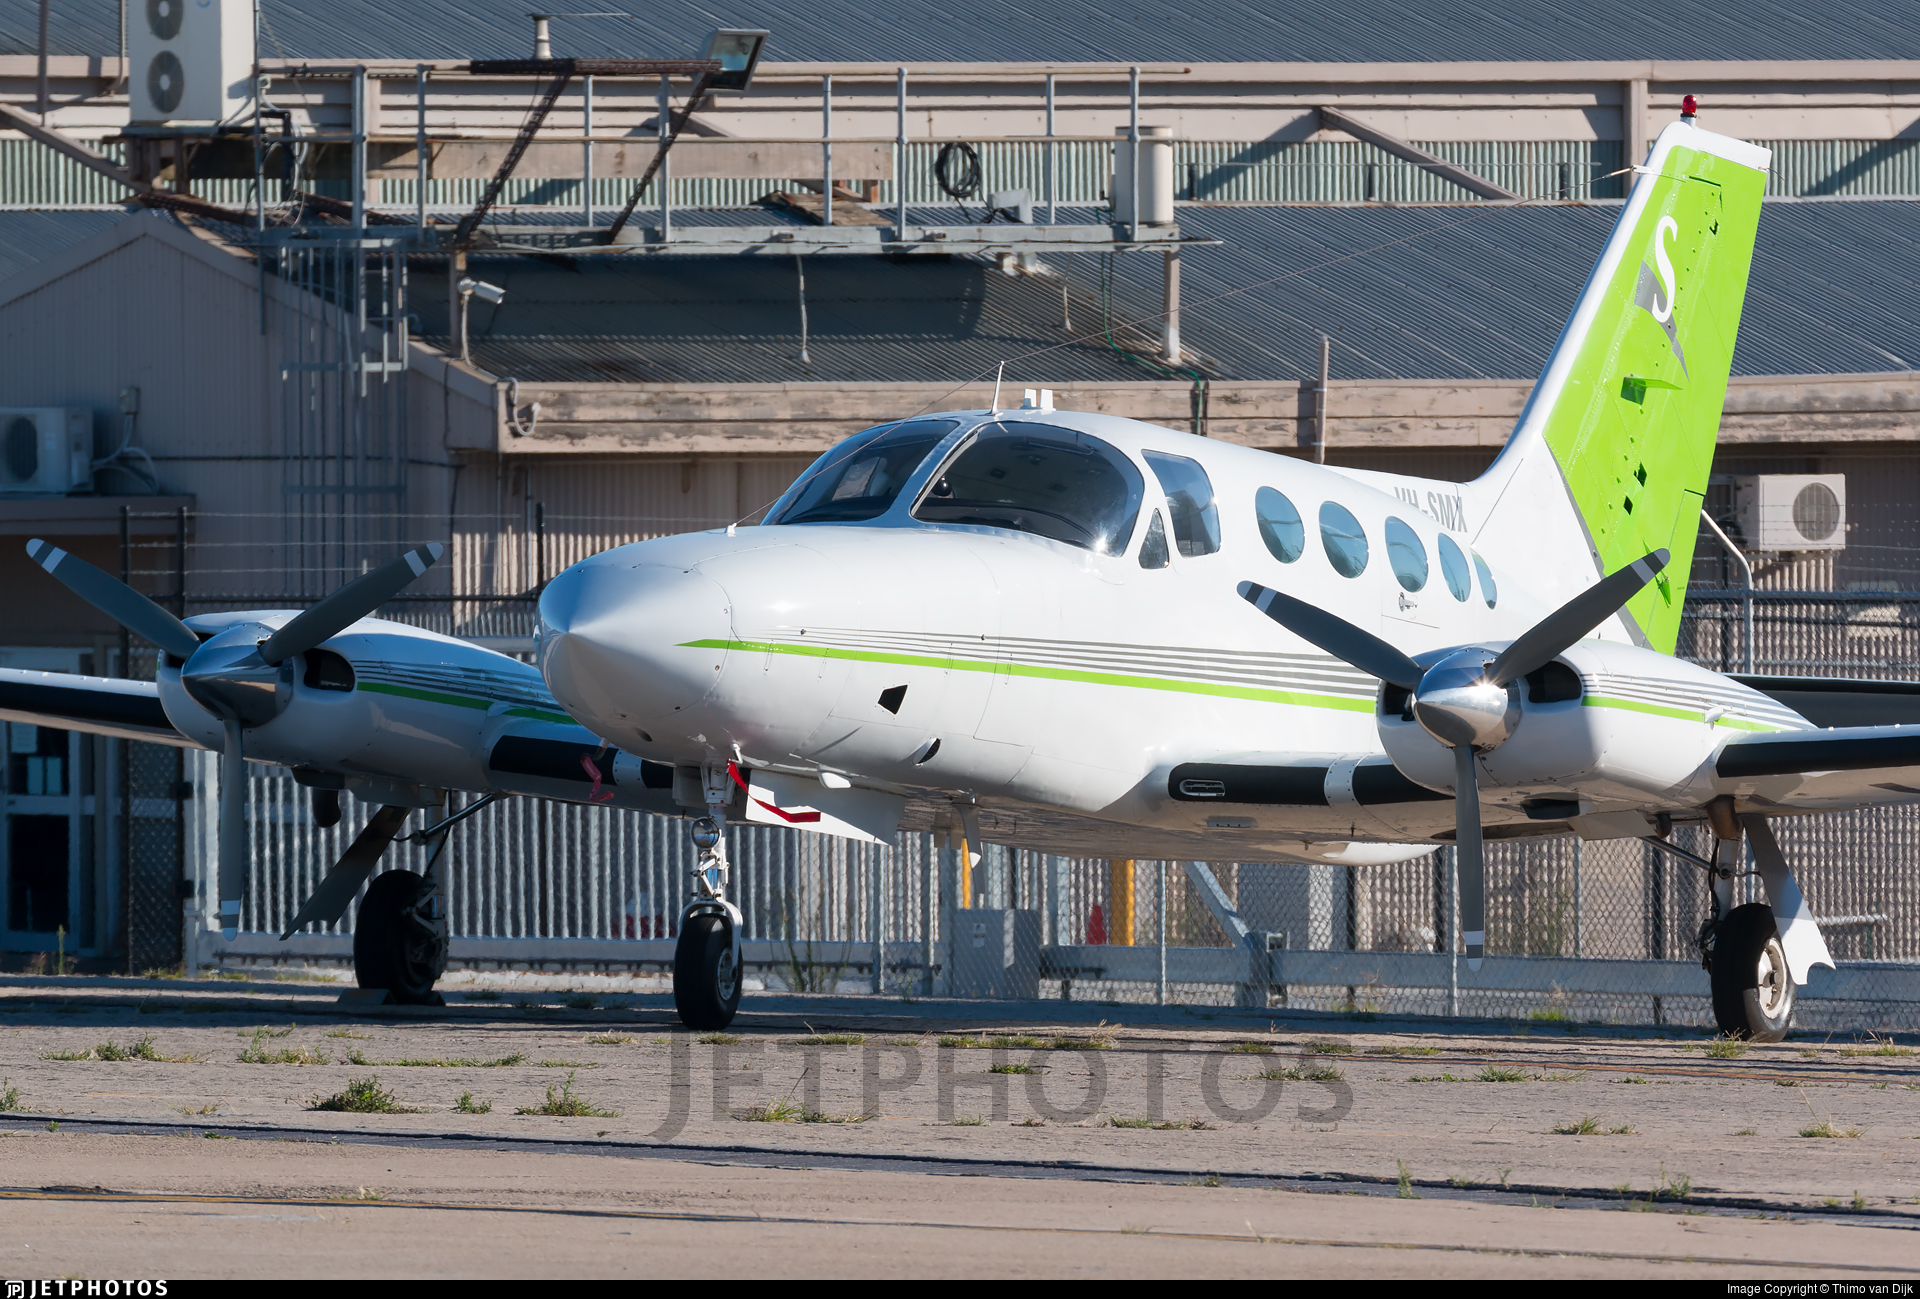 VH-SMX - Cessna 414A Chancellor - Private